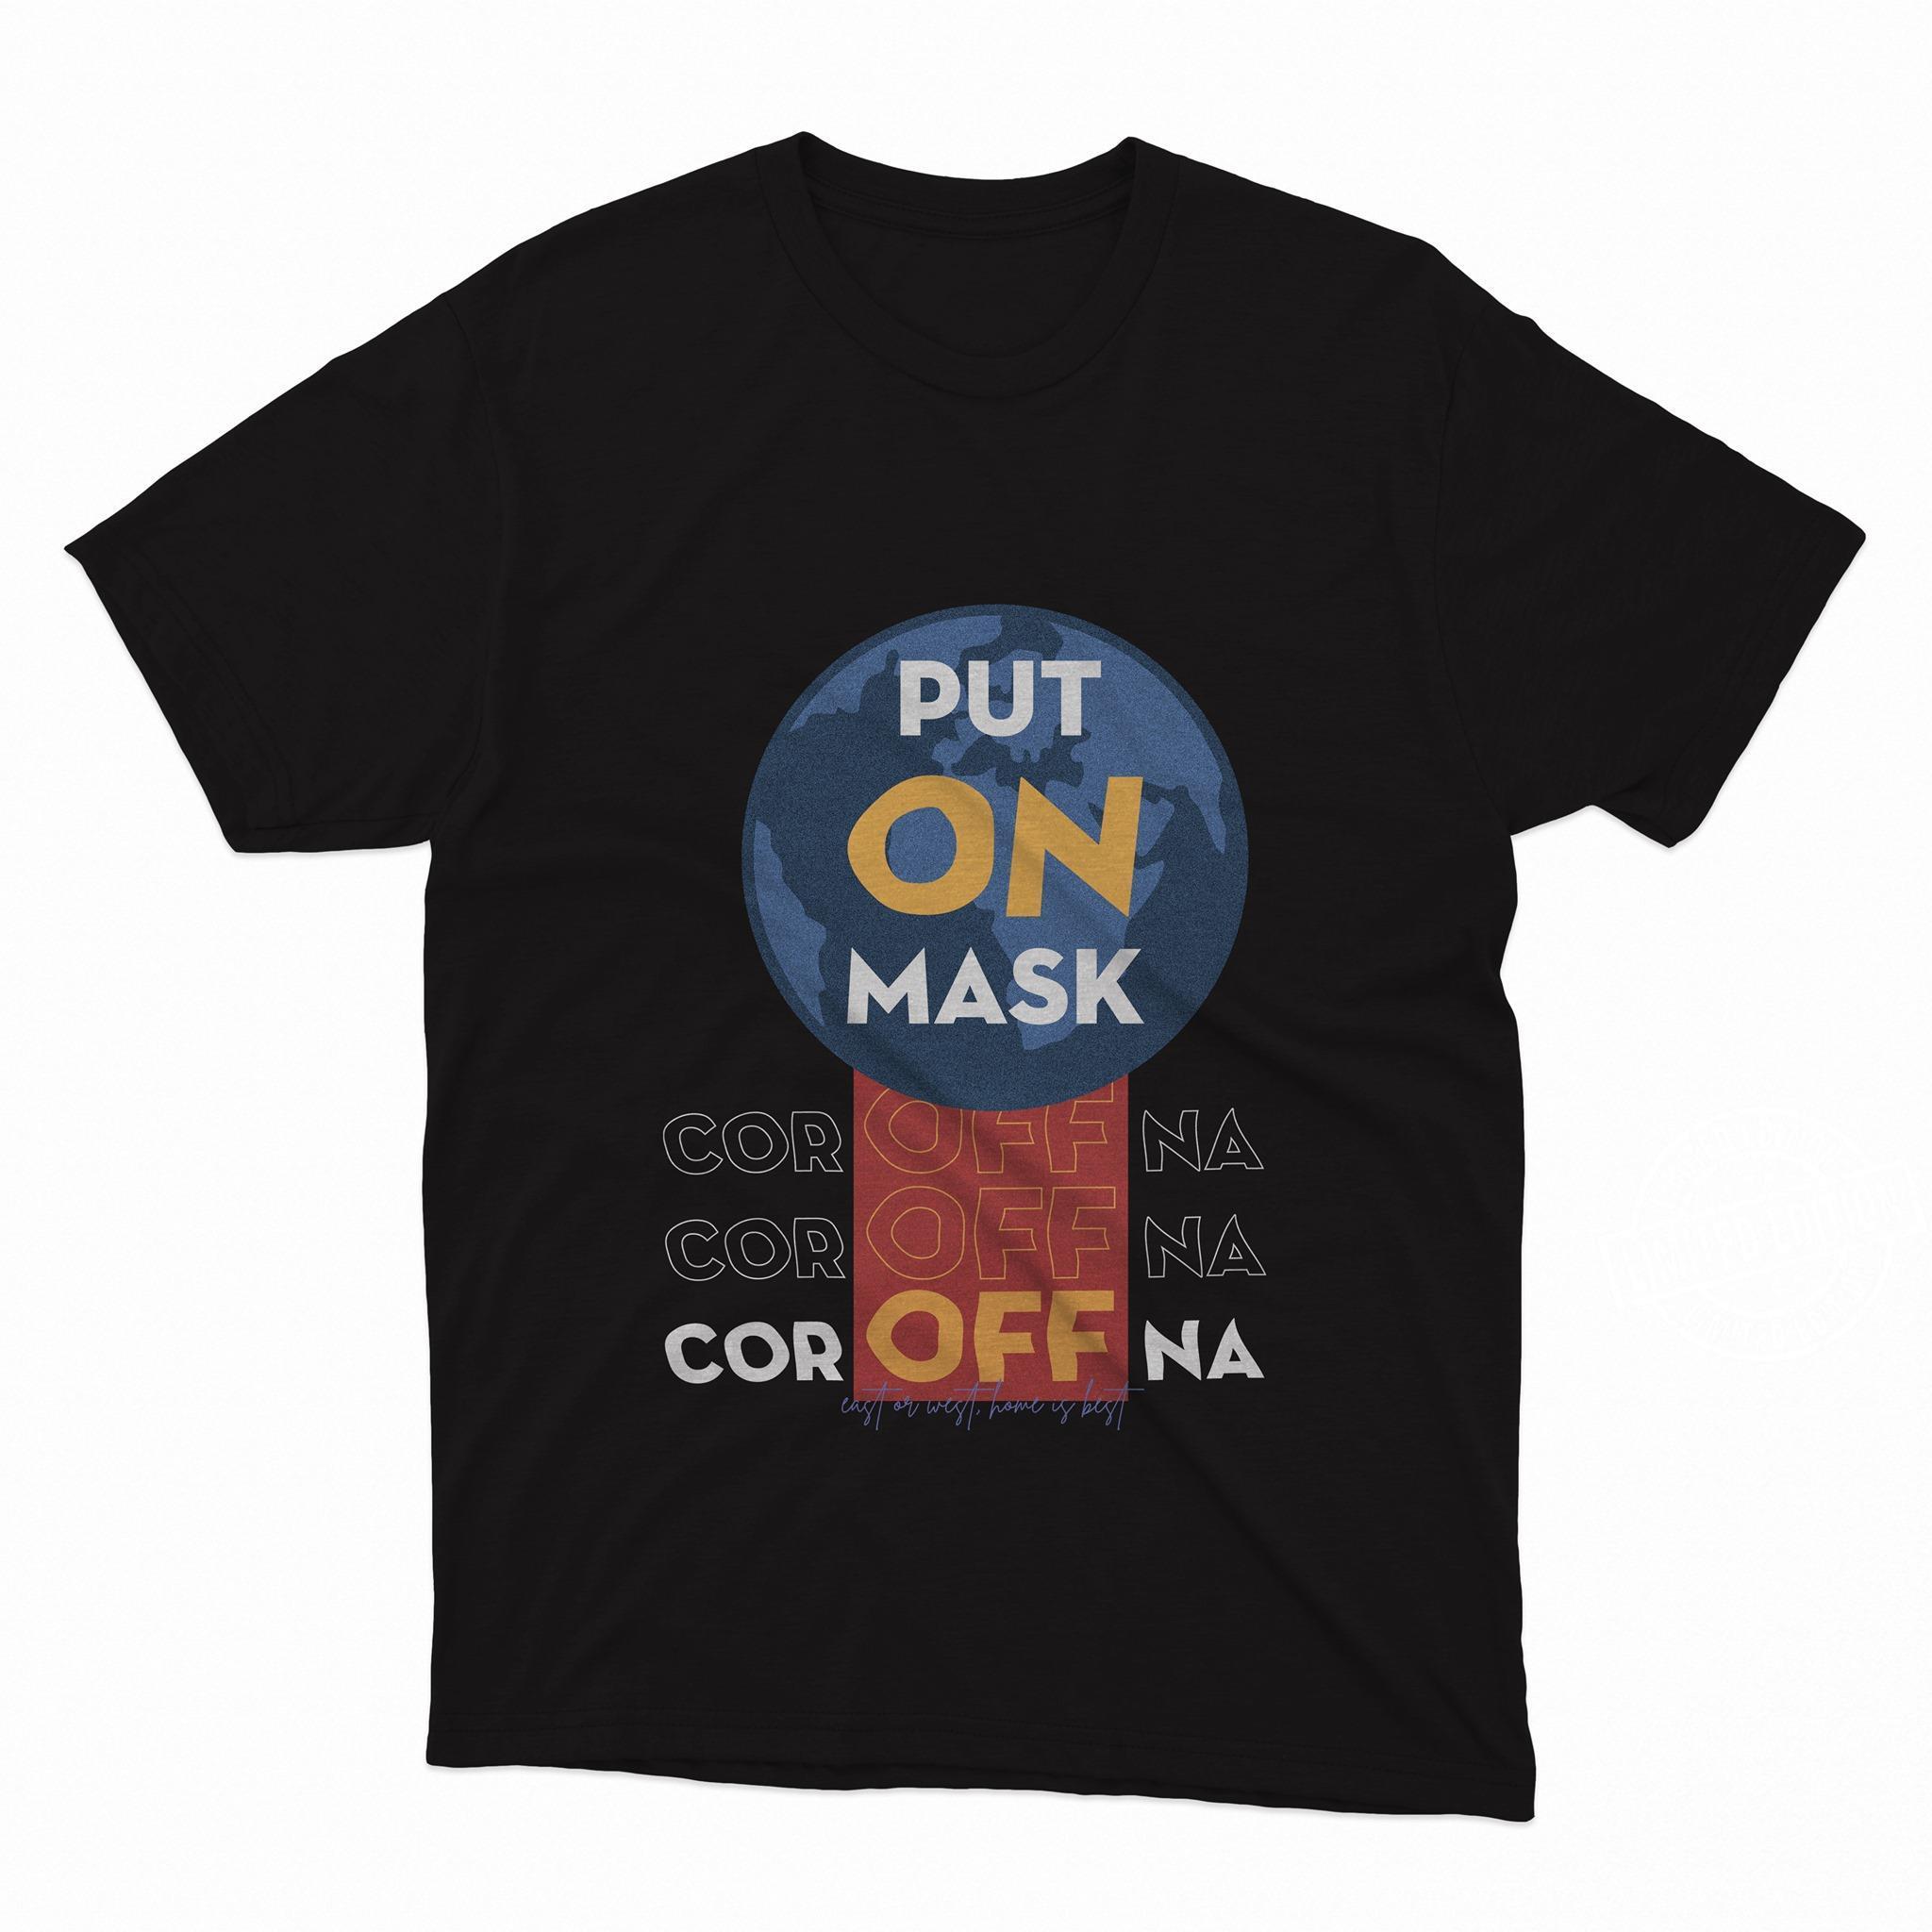 Put on mask coroffna coroffna shirt